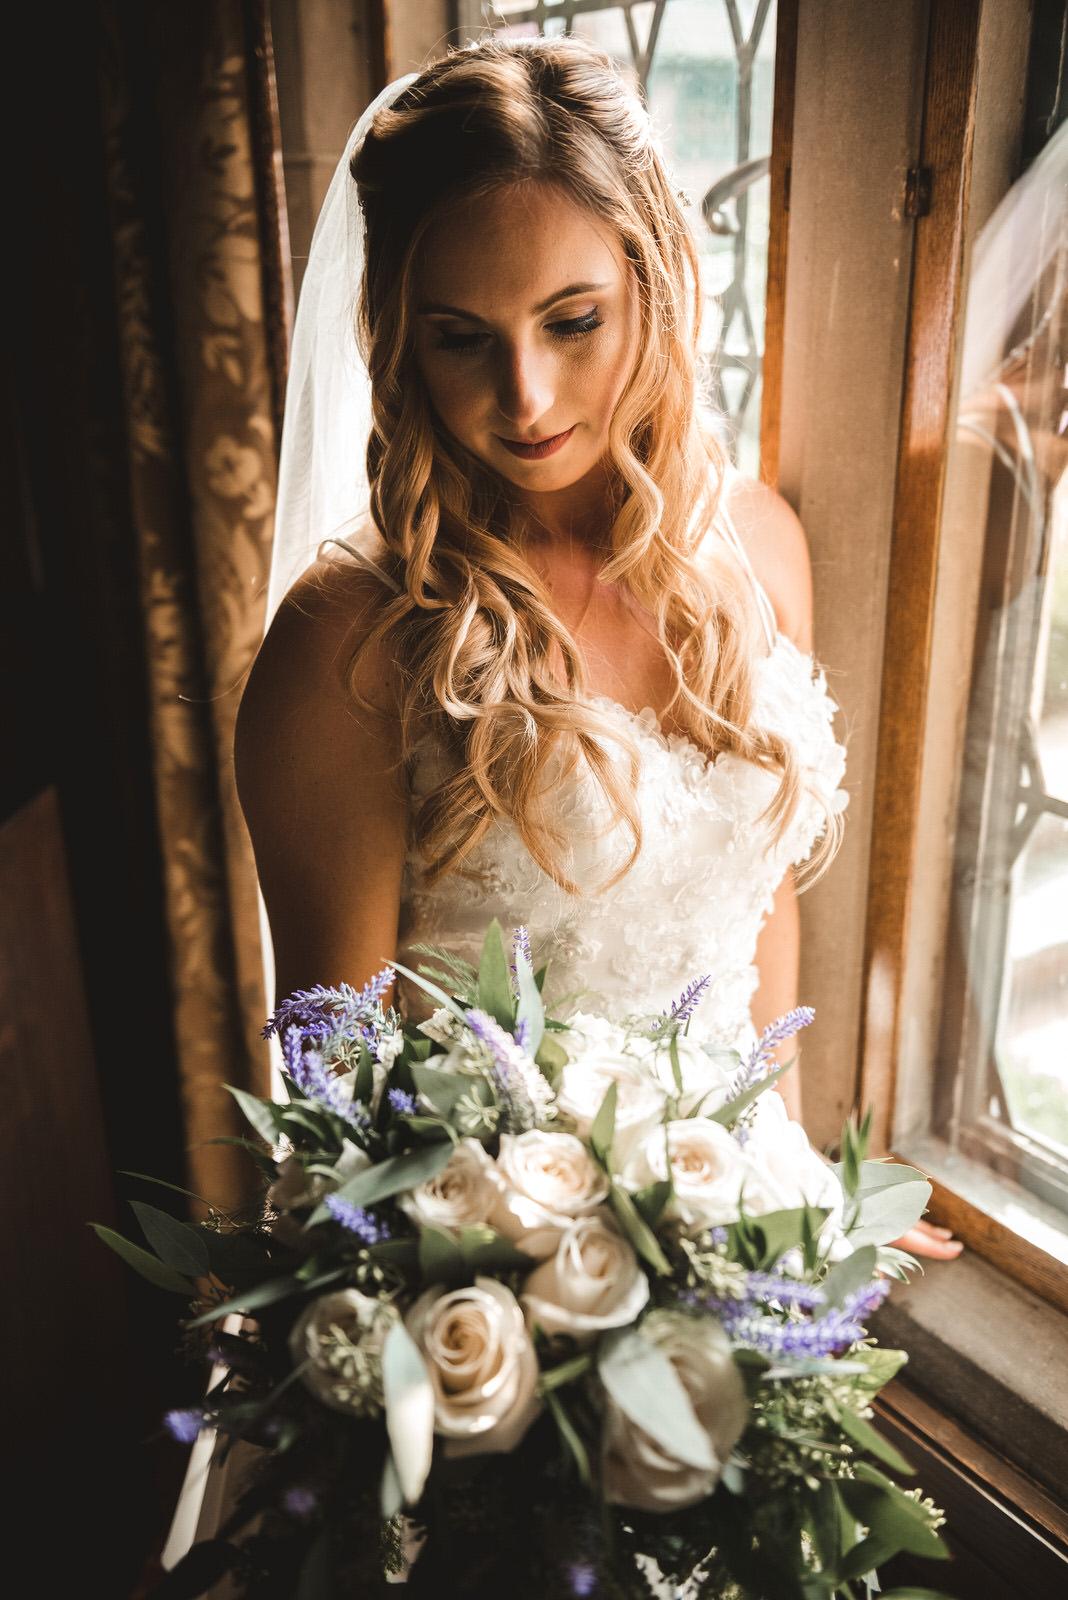 athens-ohio-wedding-bride